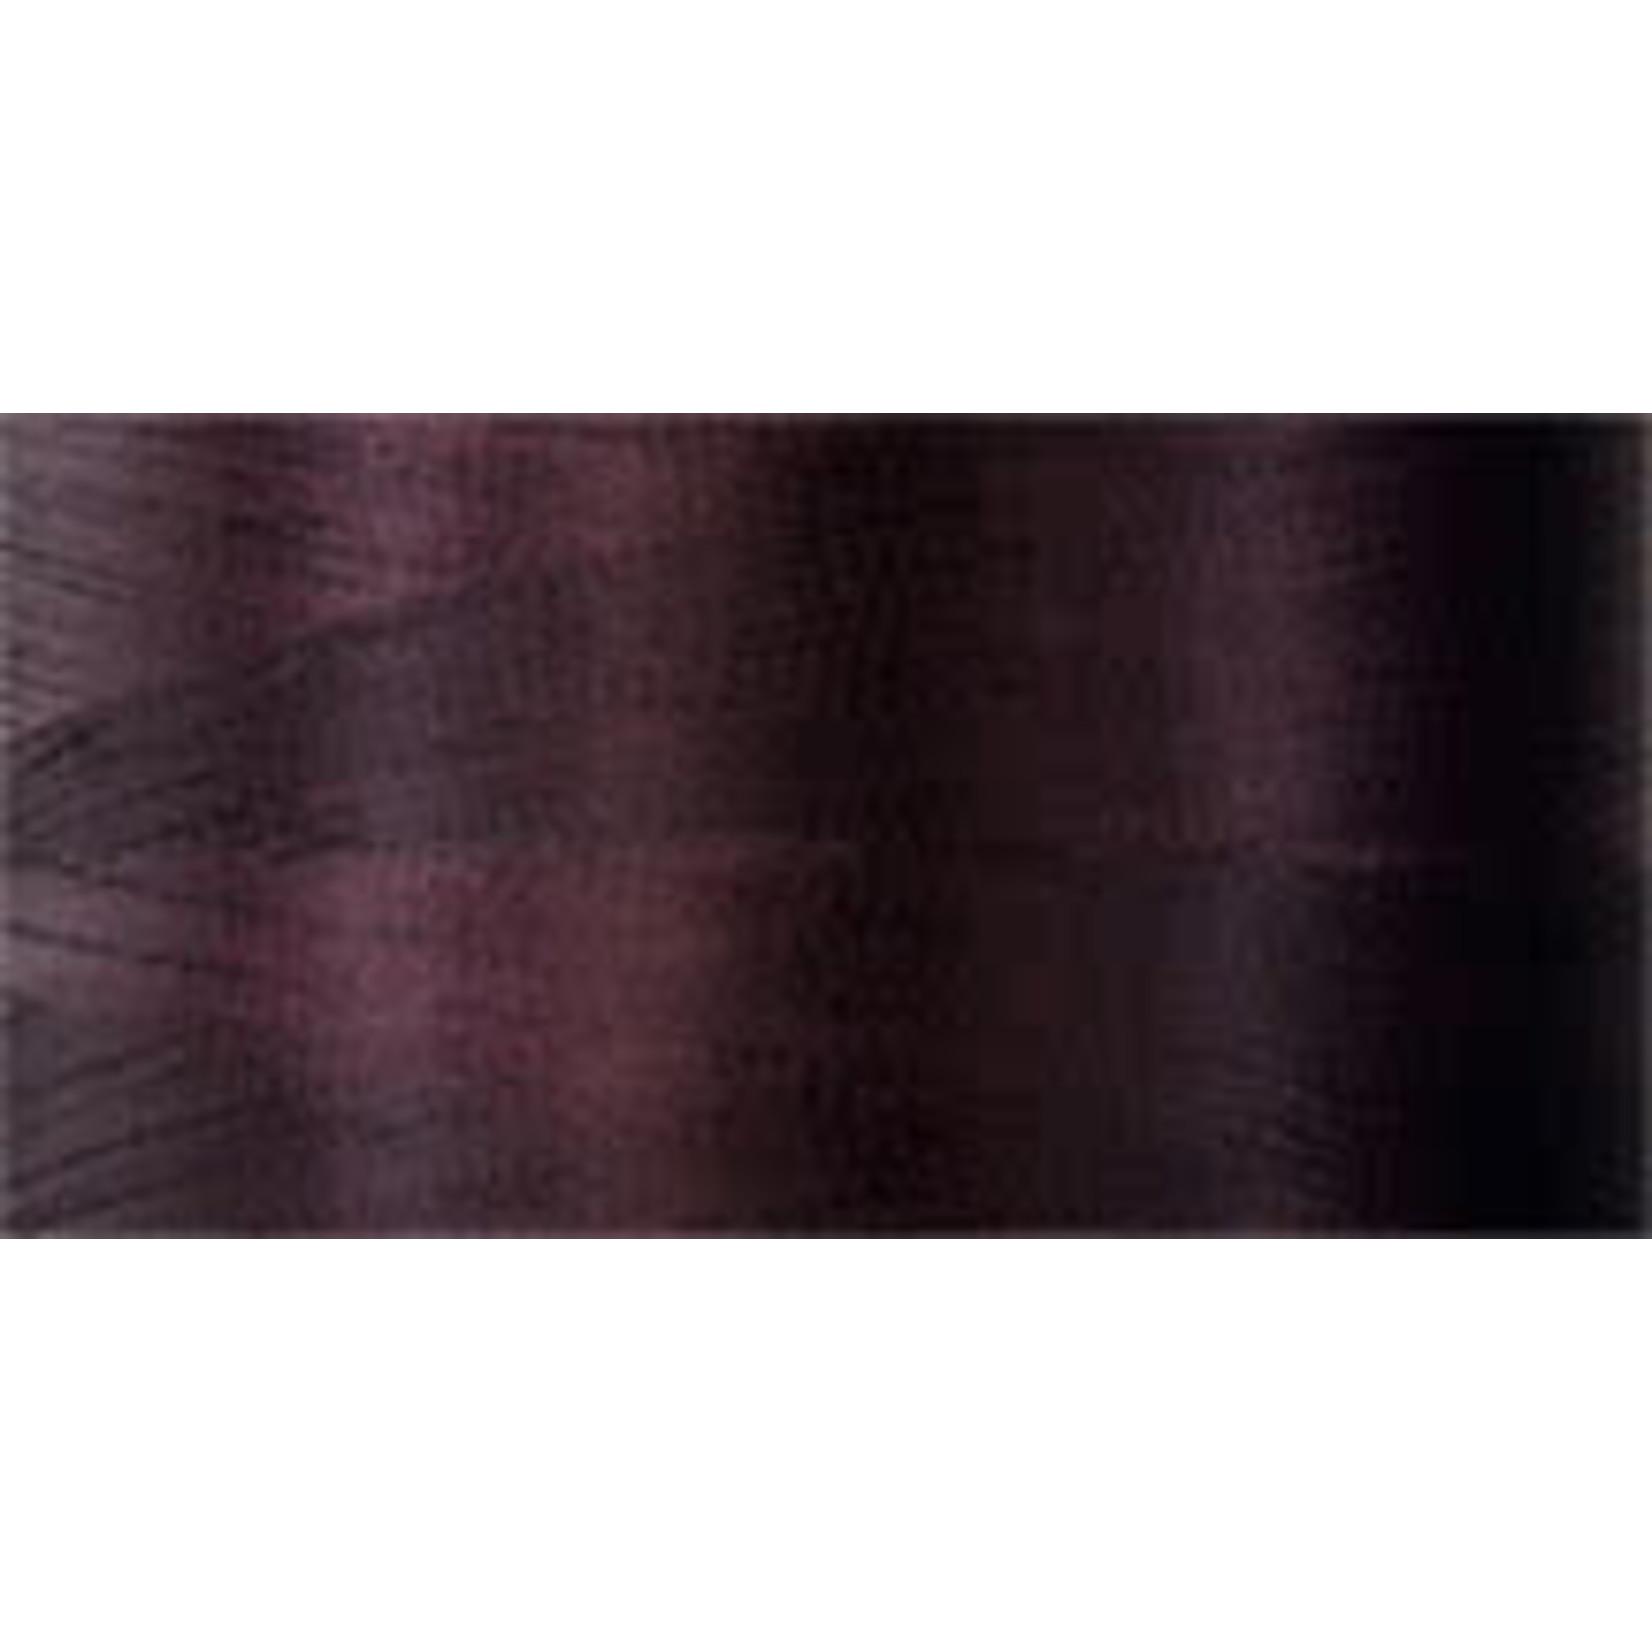 Superior Threads Bottom Line - #60 - 1300 m - 626 Plumber